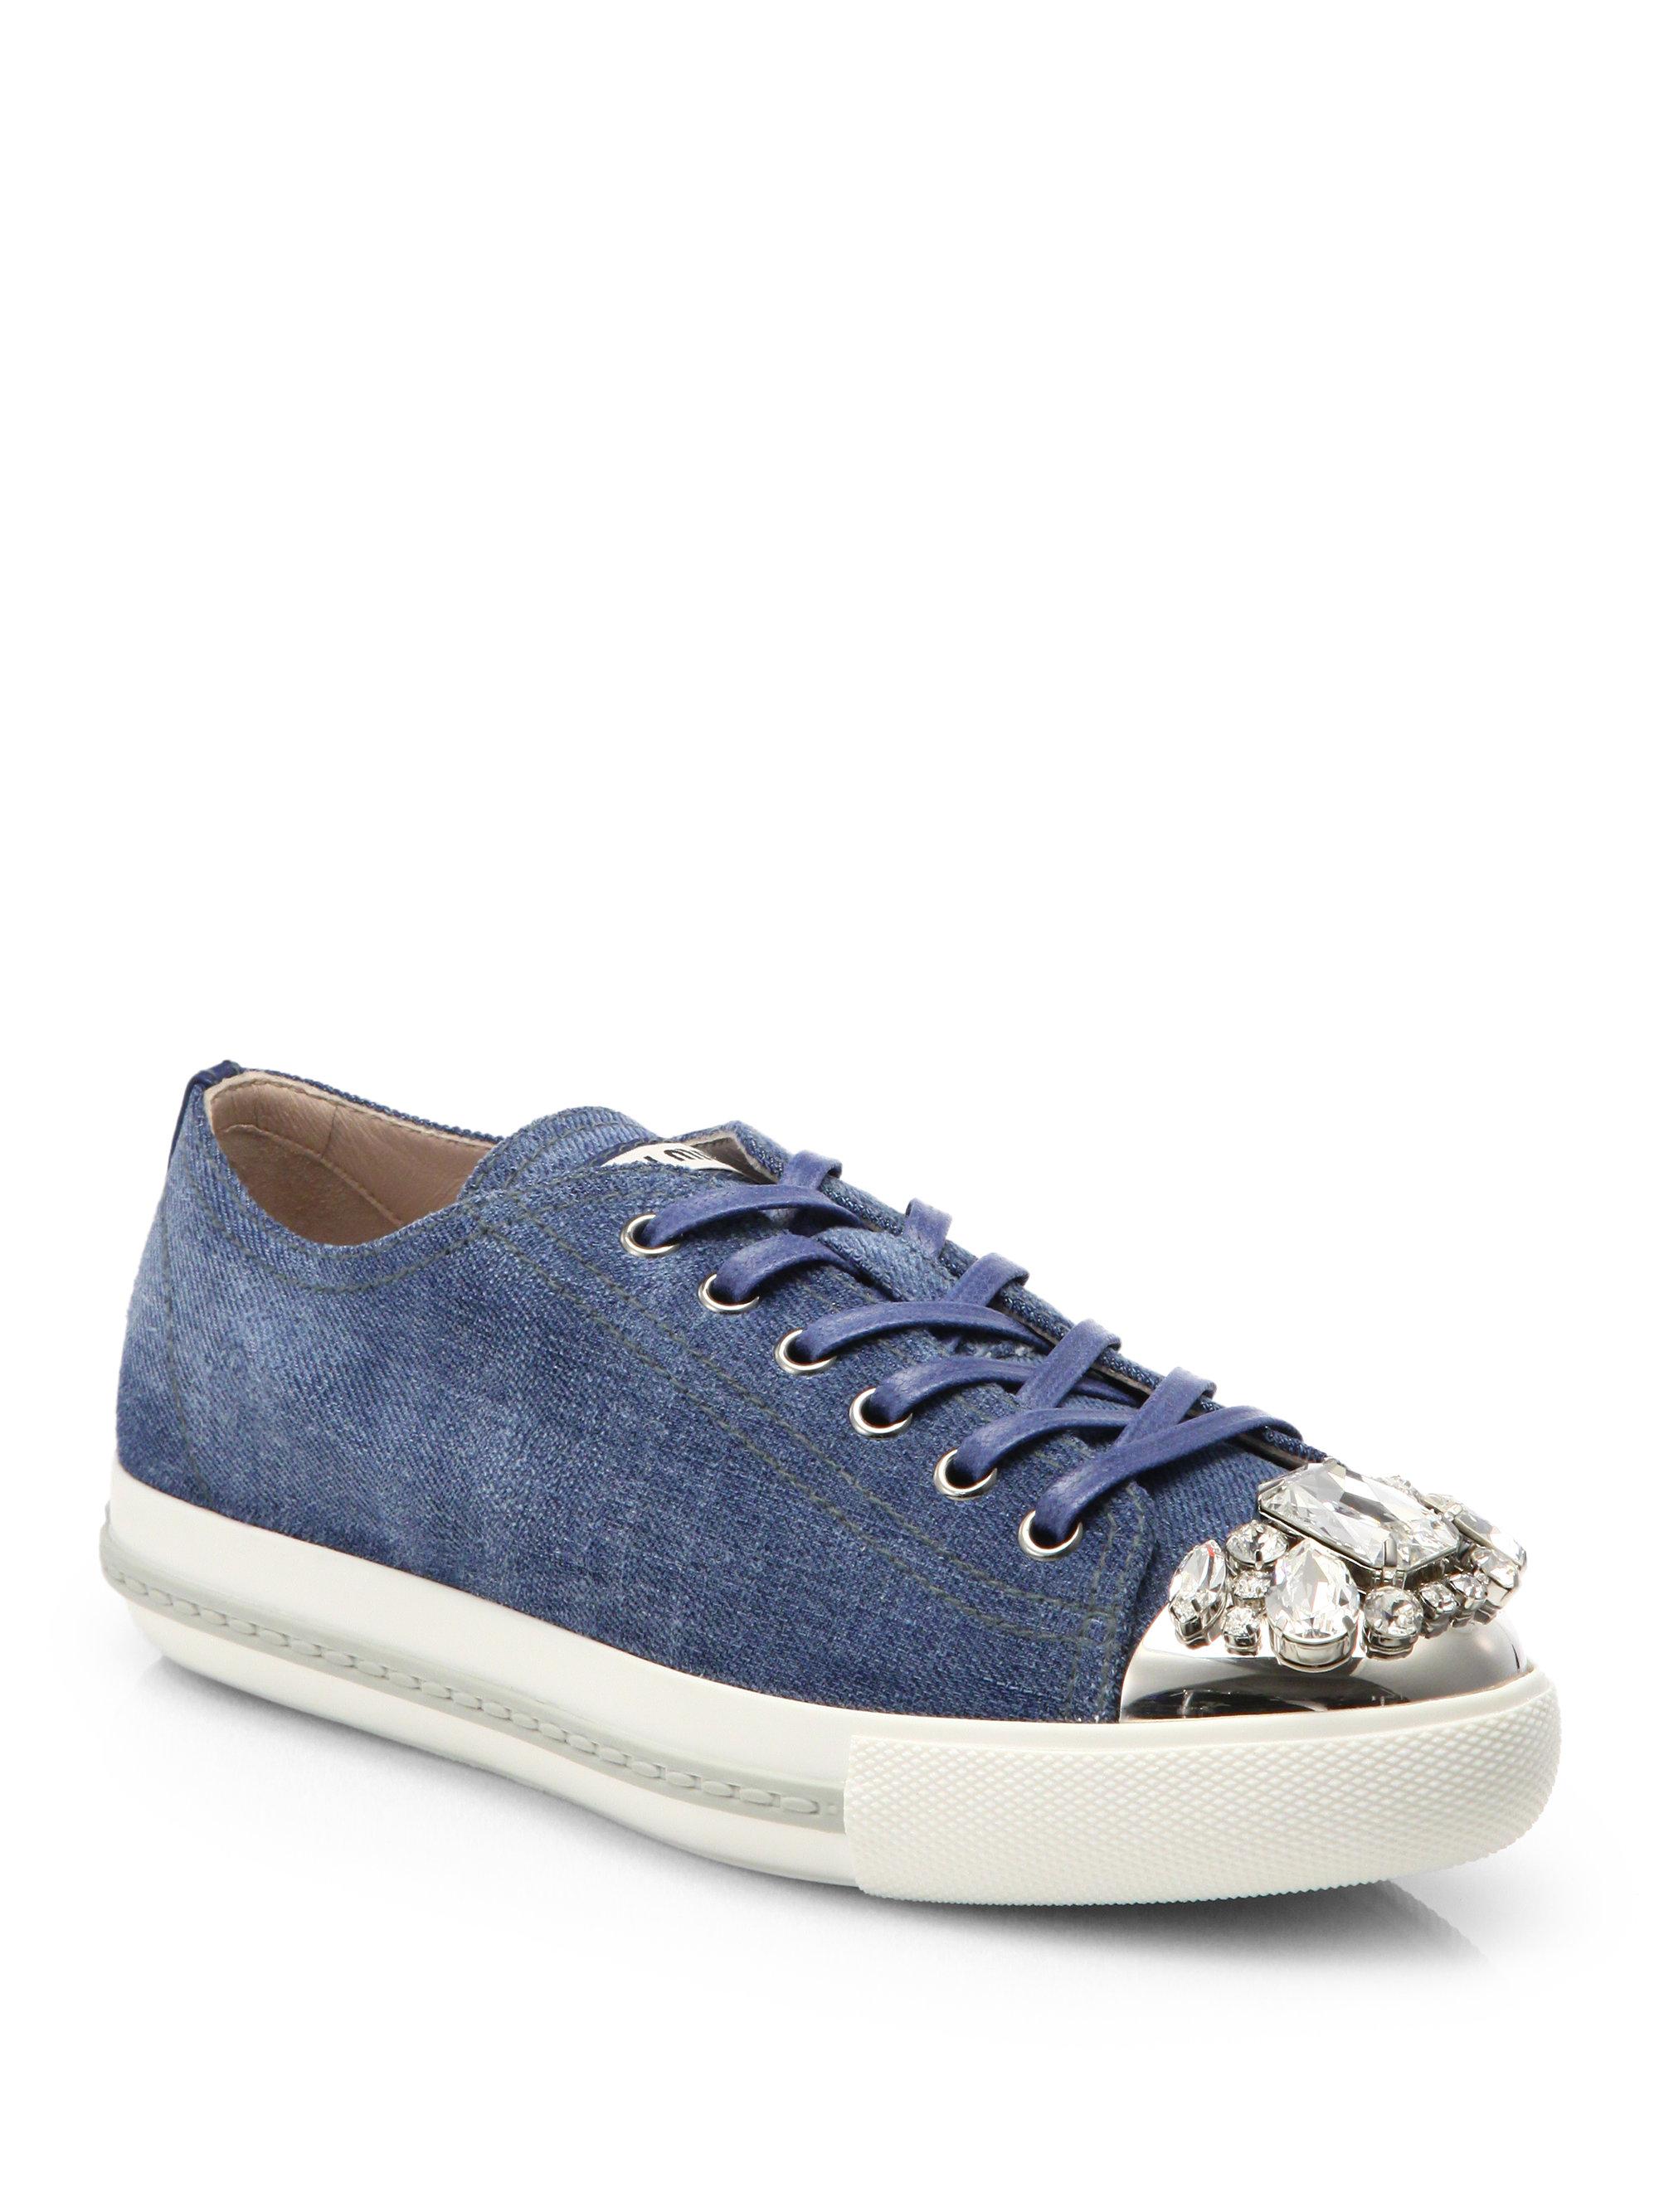 miu miu denim crystaltoe laceup sneakers in blue lyst. Black Bedroom Furniture Sets. Home Design Ideas